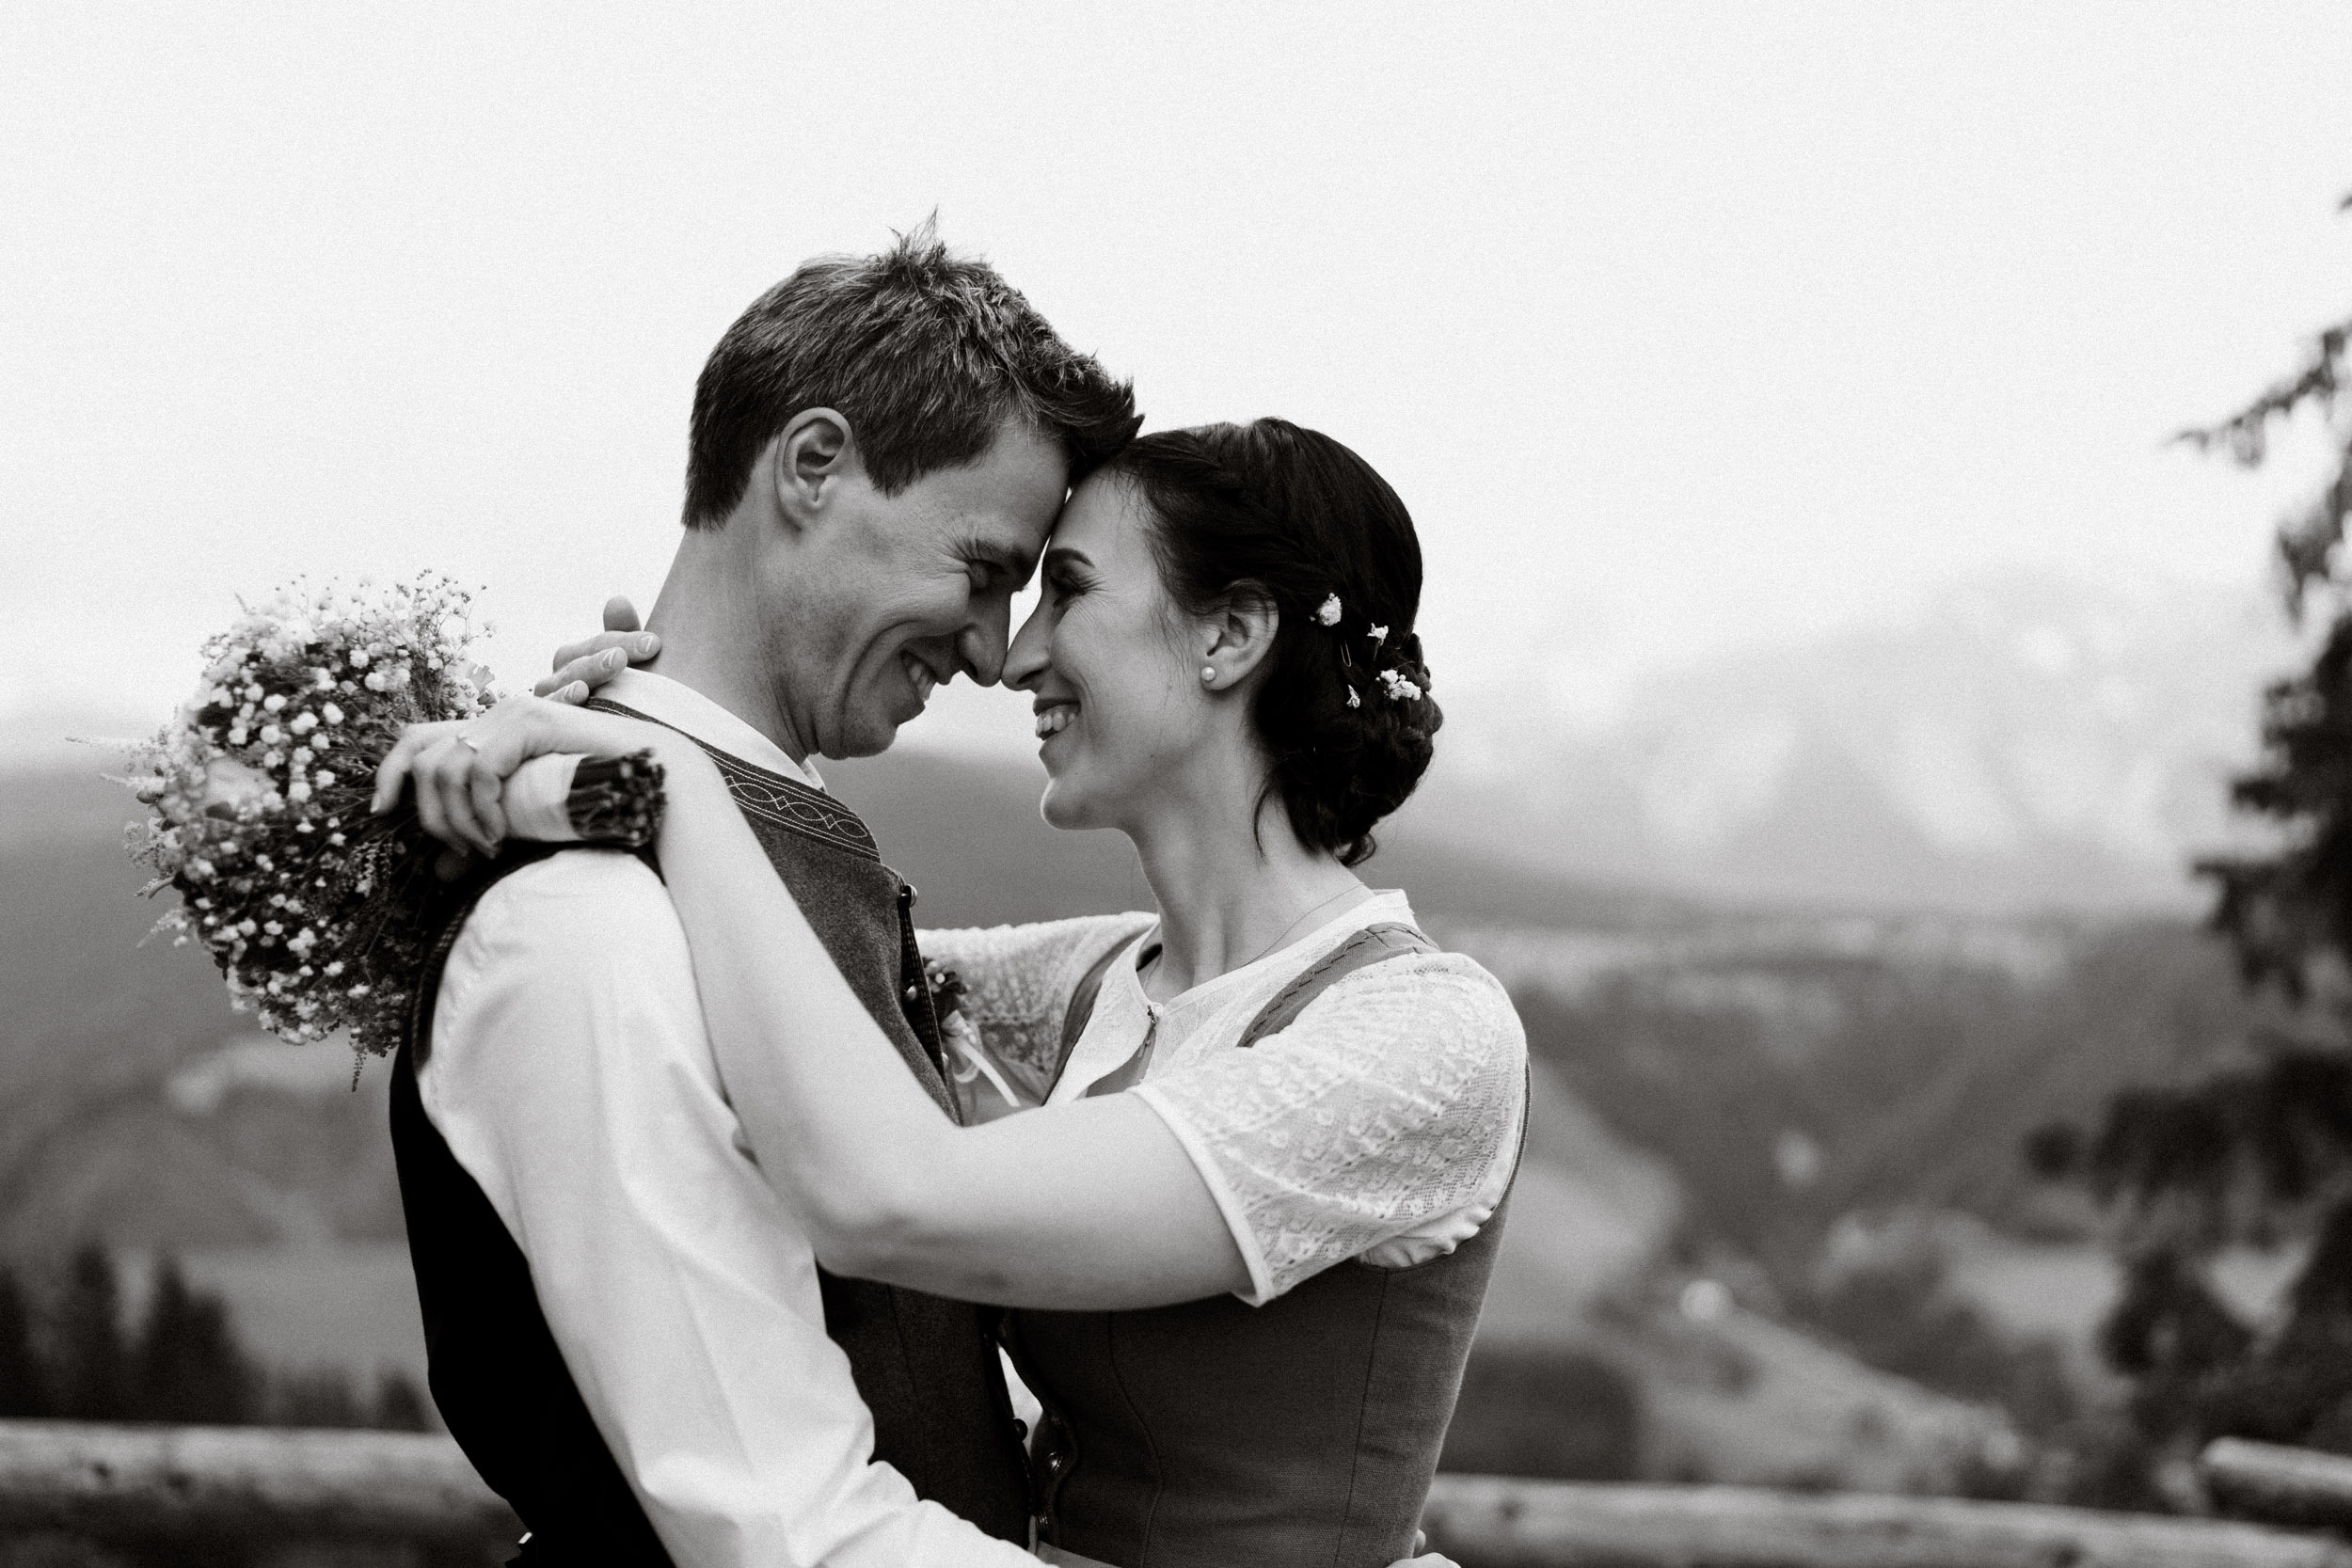 austria_mountain_wedding_photography_countryside_vienna-17.jpg